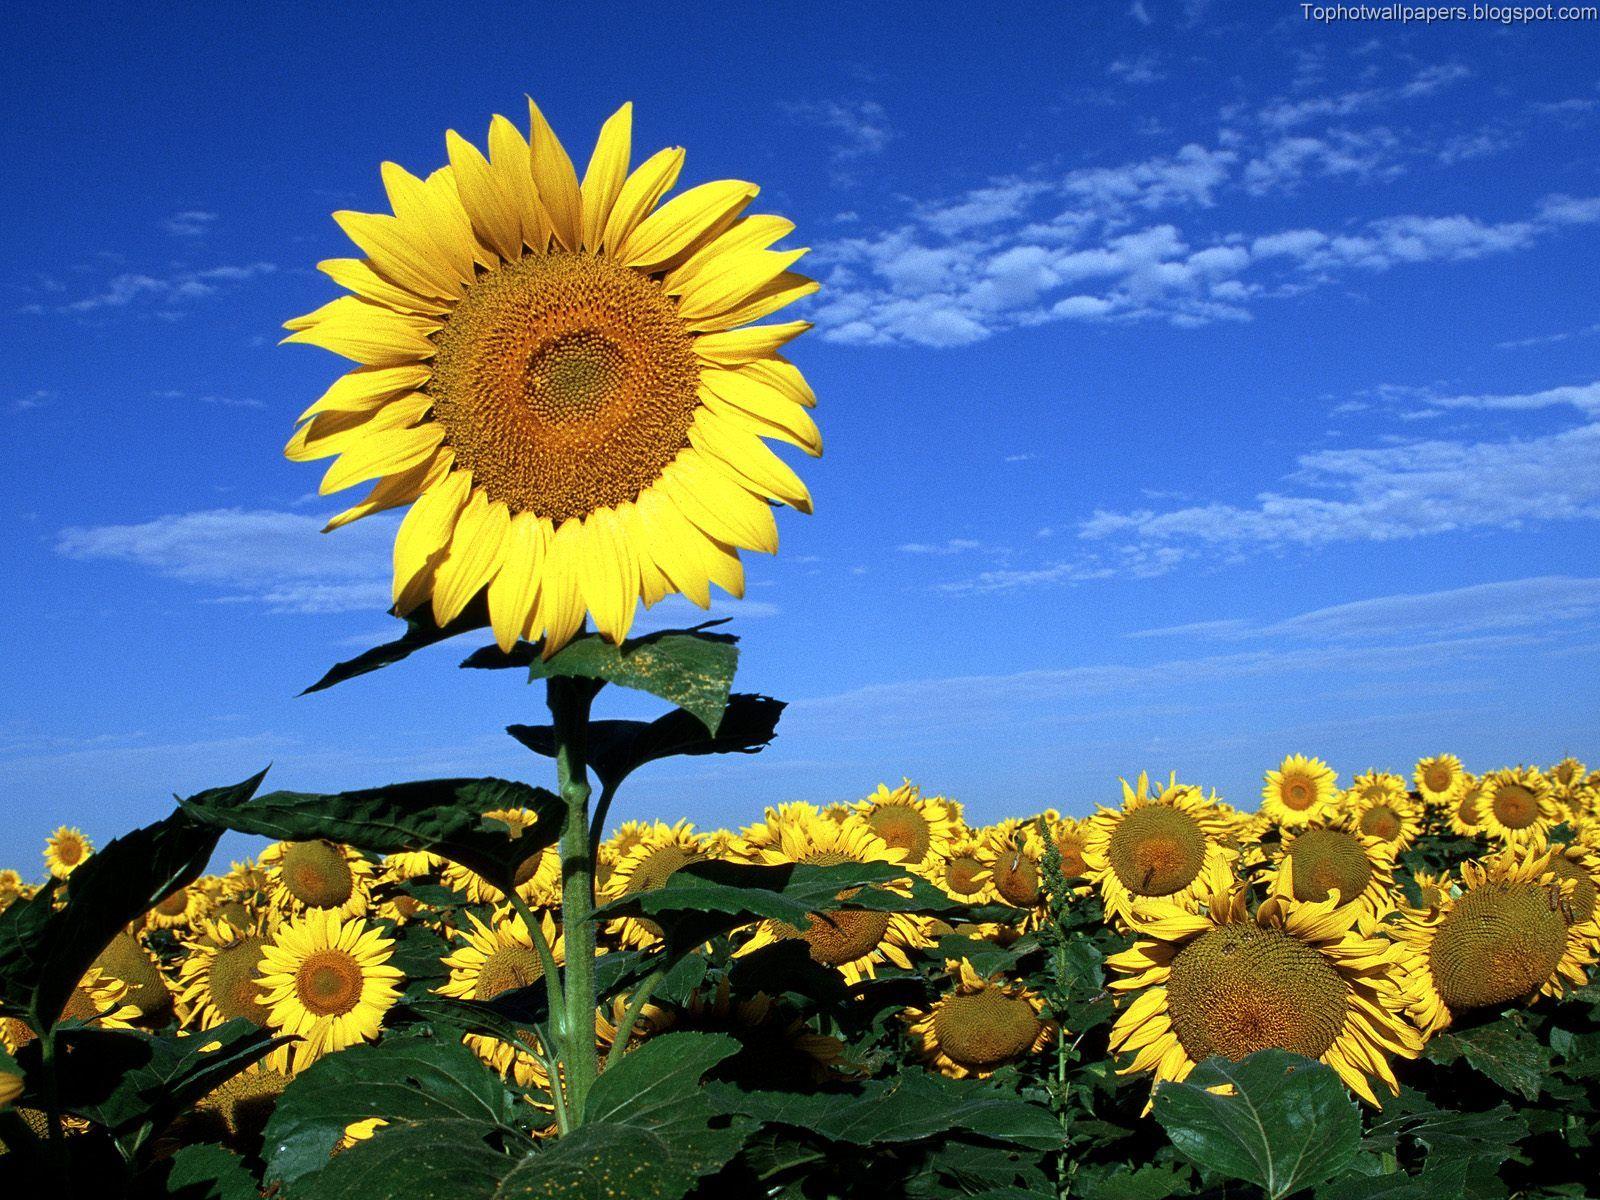 http://4.bp.blogspot.com/_-Cb_iV_LnpU/Ry9SzLHm5bI/AAAAAAAABIc/kvEJsTuLZSY/s1600/Spring%2BDreaming.jpg